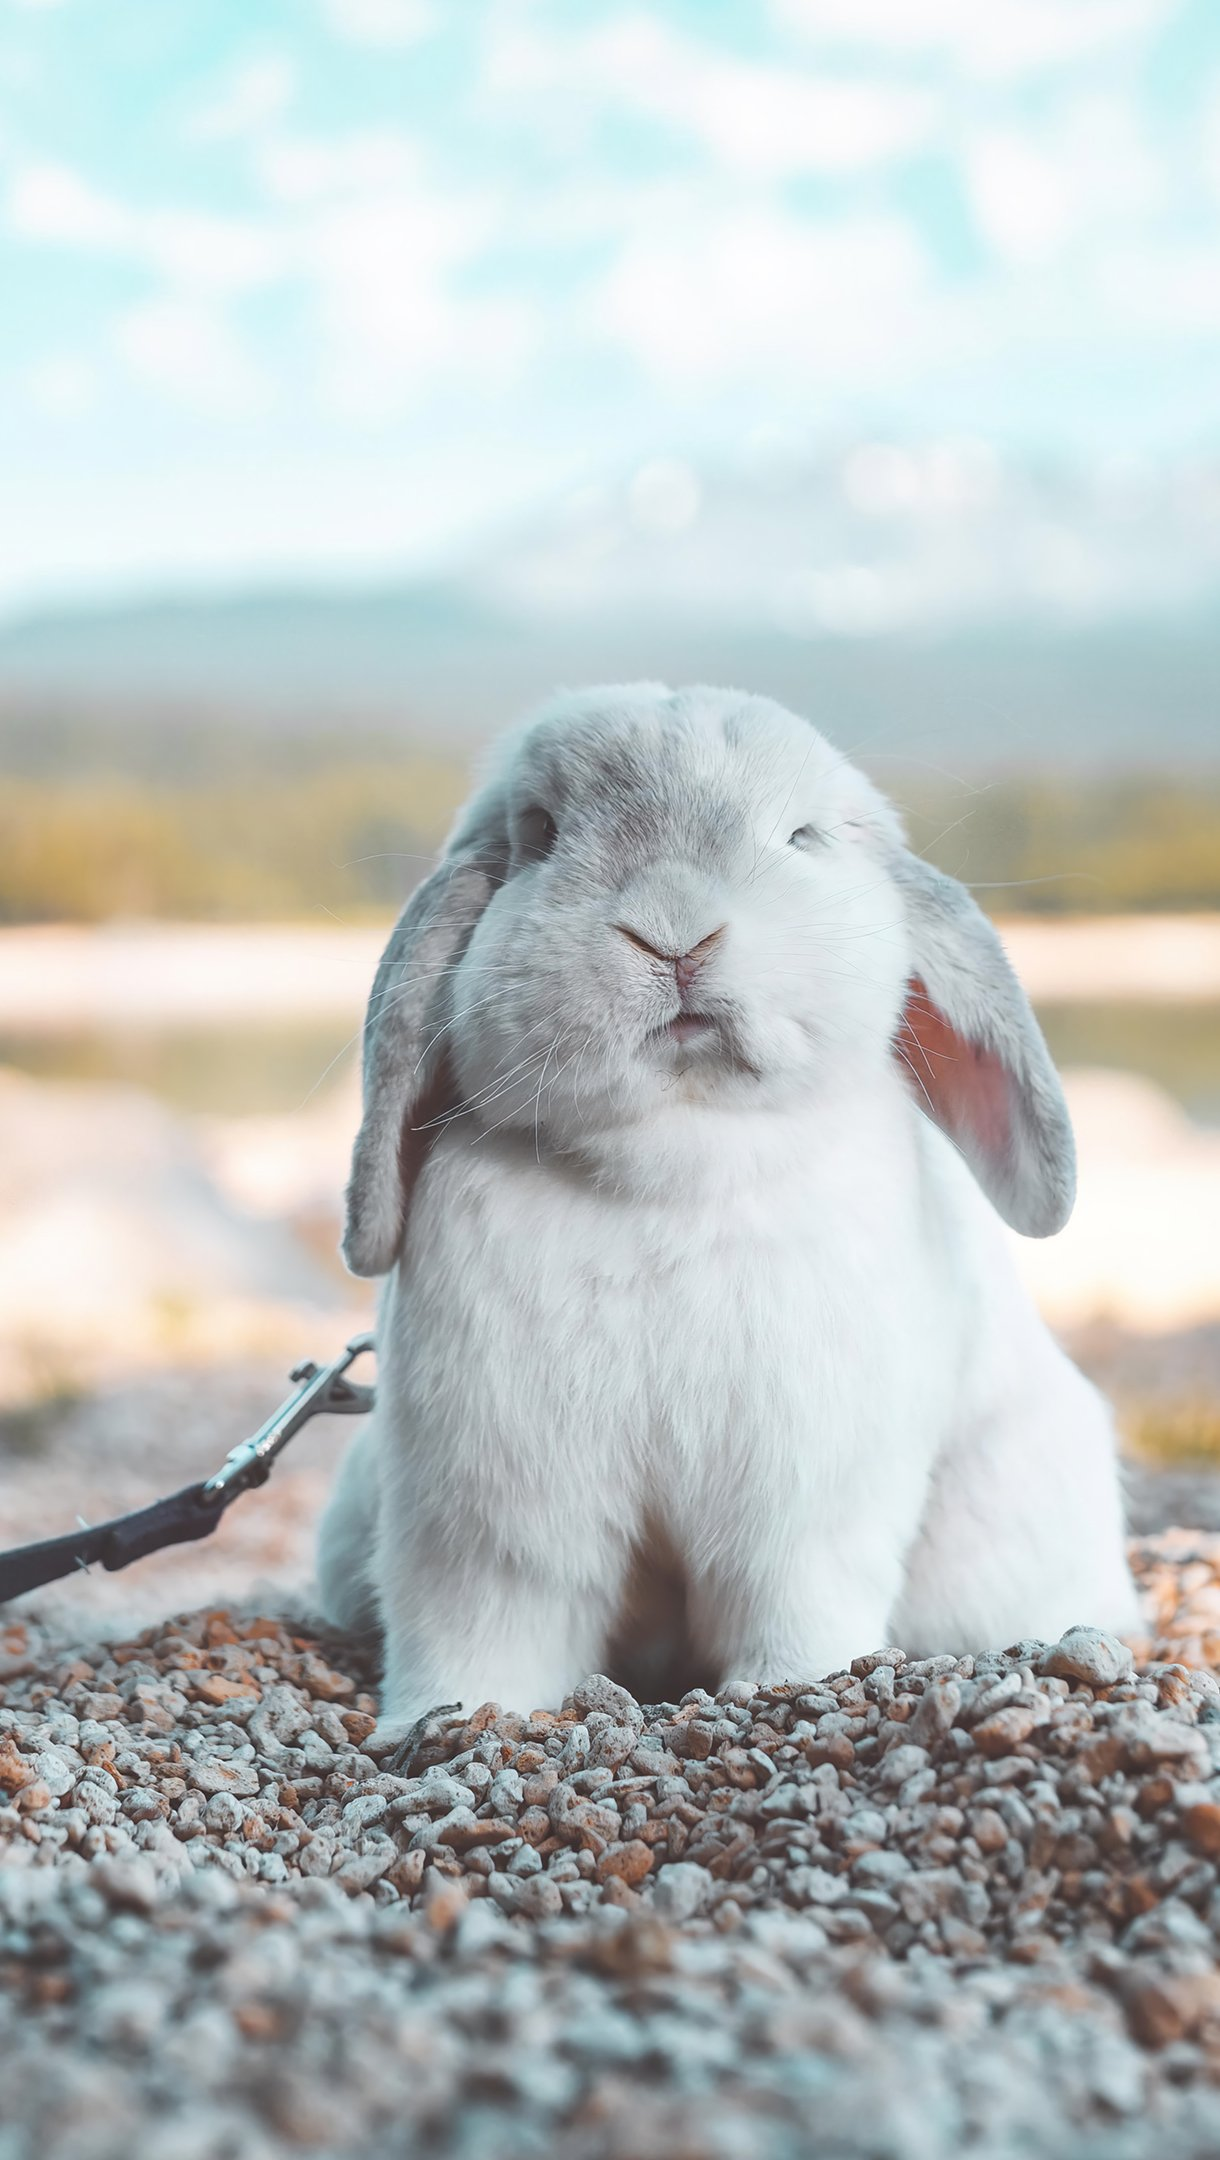 Fondos de pantalla Conejo Vertical